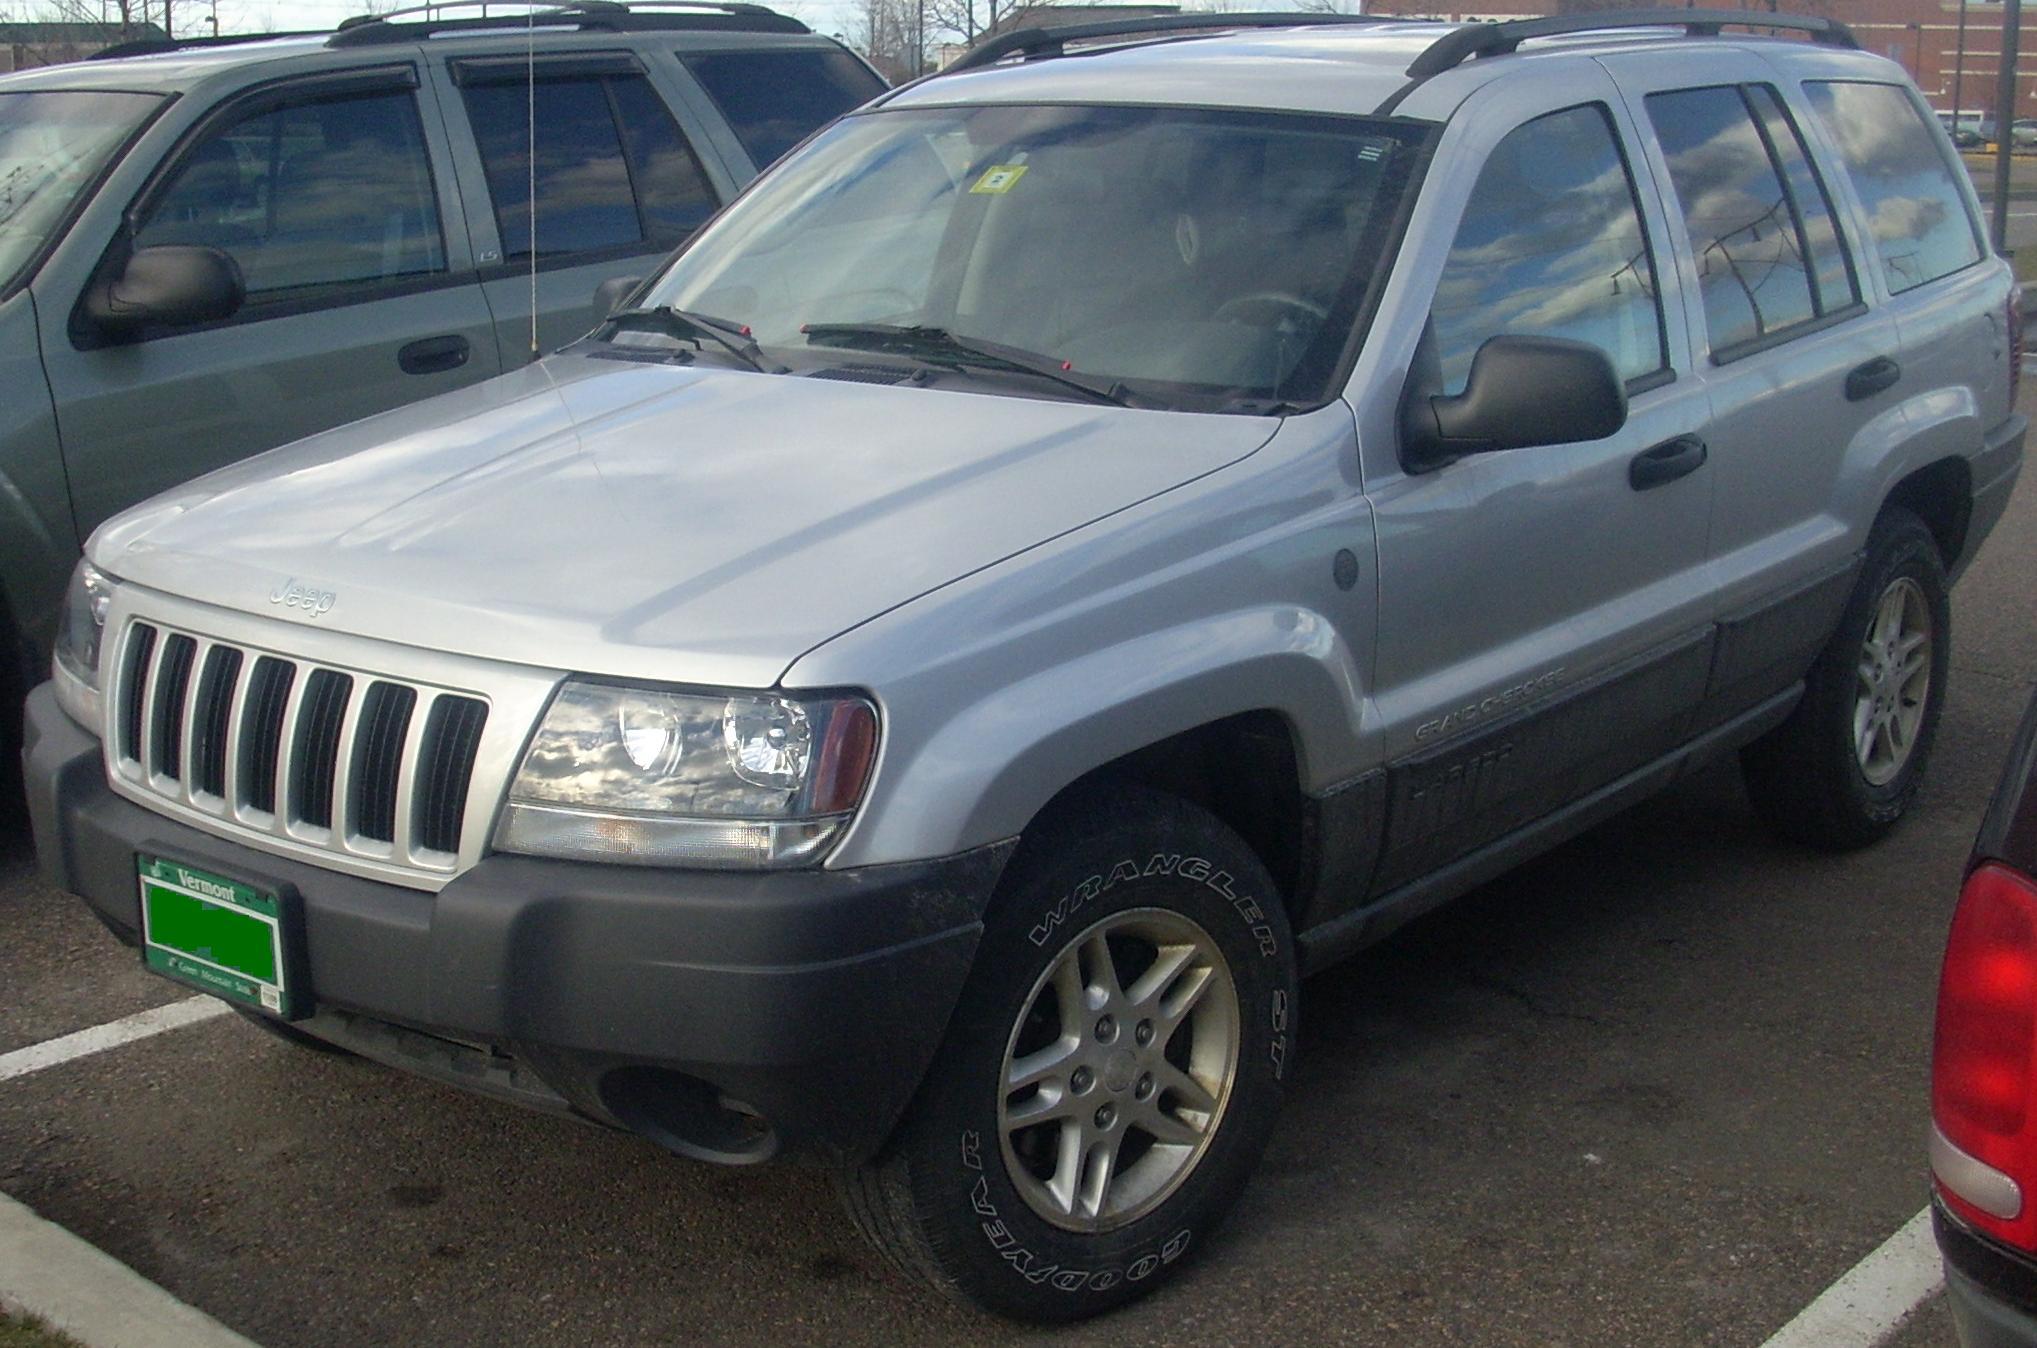 File:2004 Jeep Grand Cherokee.jpg - Wikimedia Commons